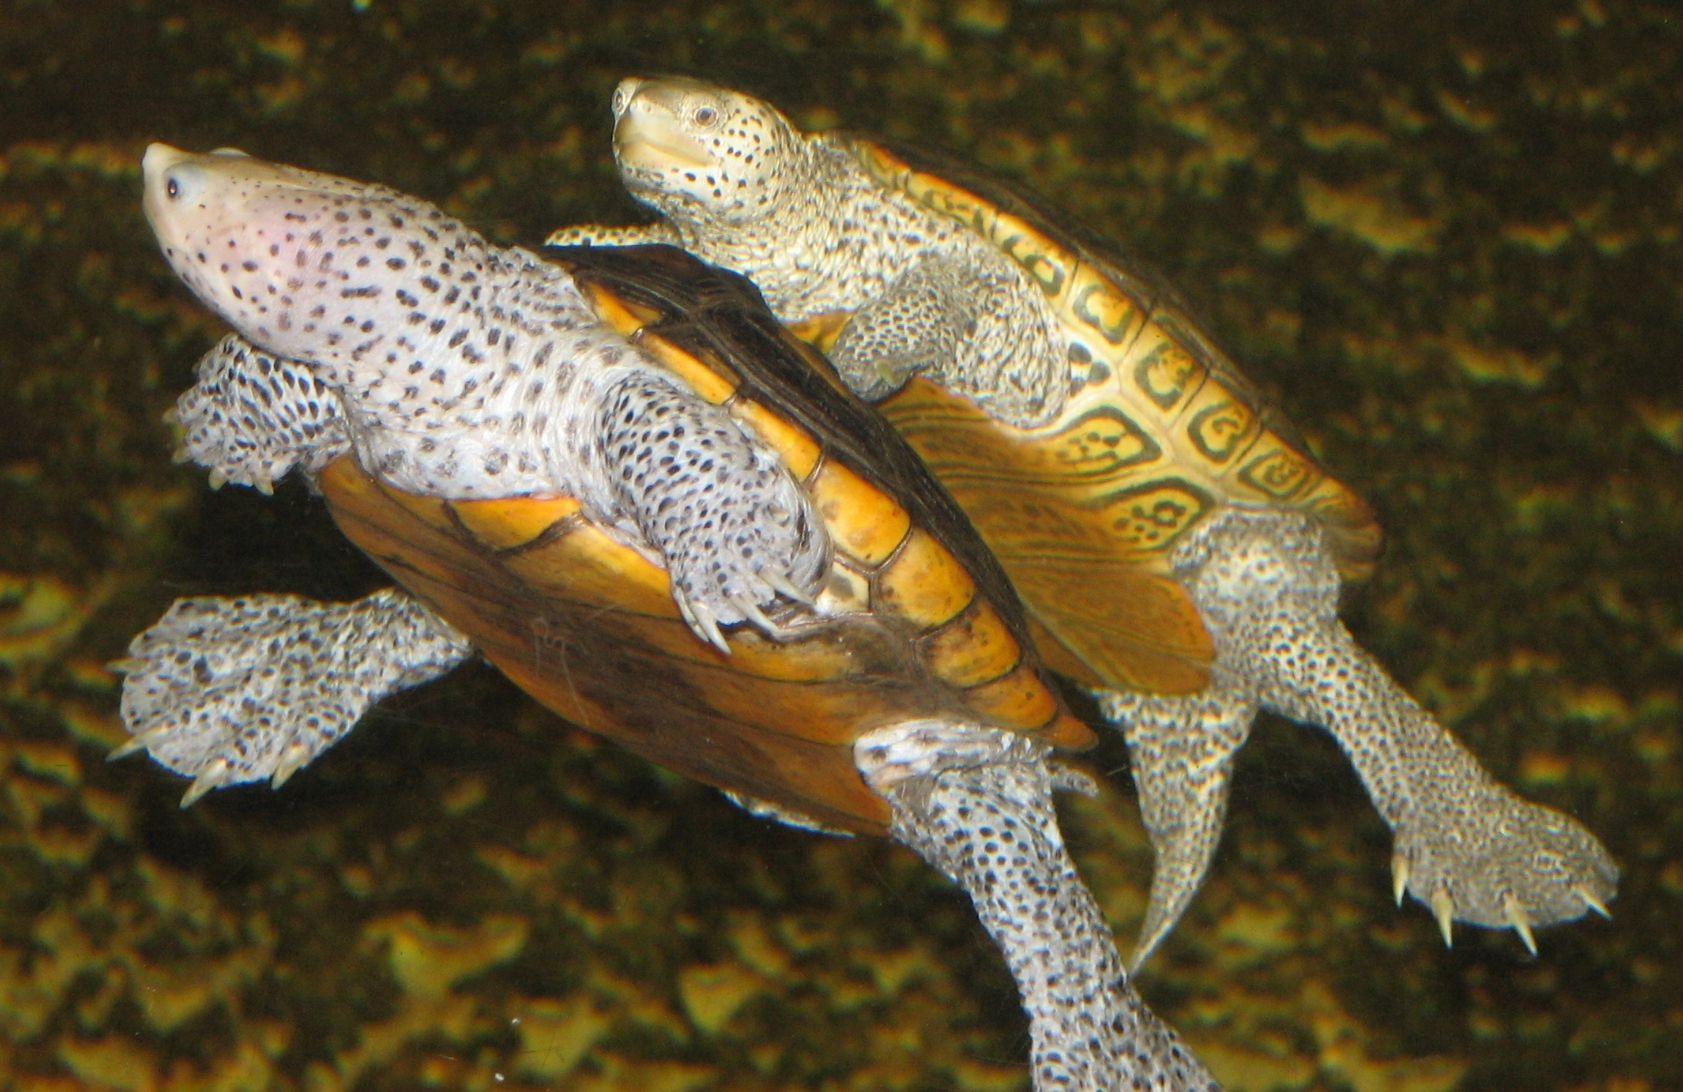 Diamondback terrapins herpetology turtles tortoises amp terrapins